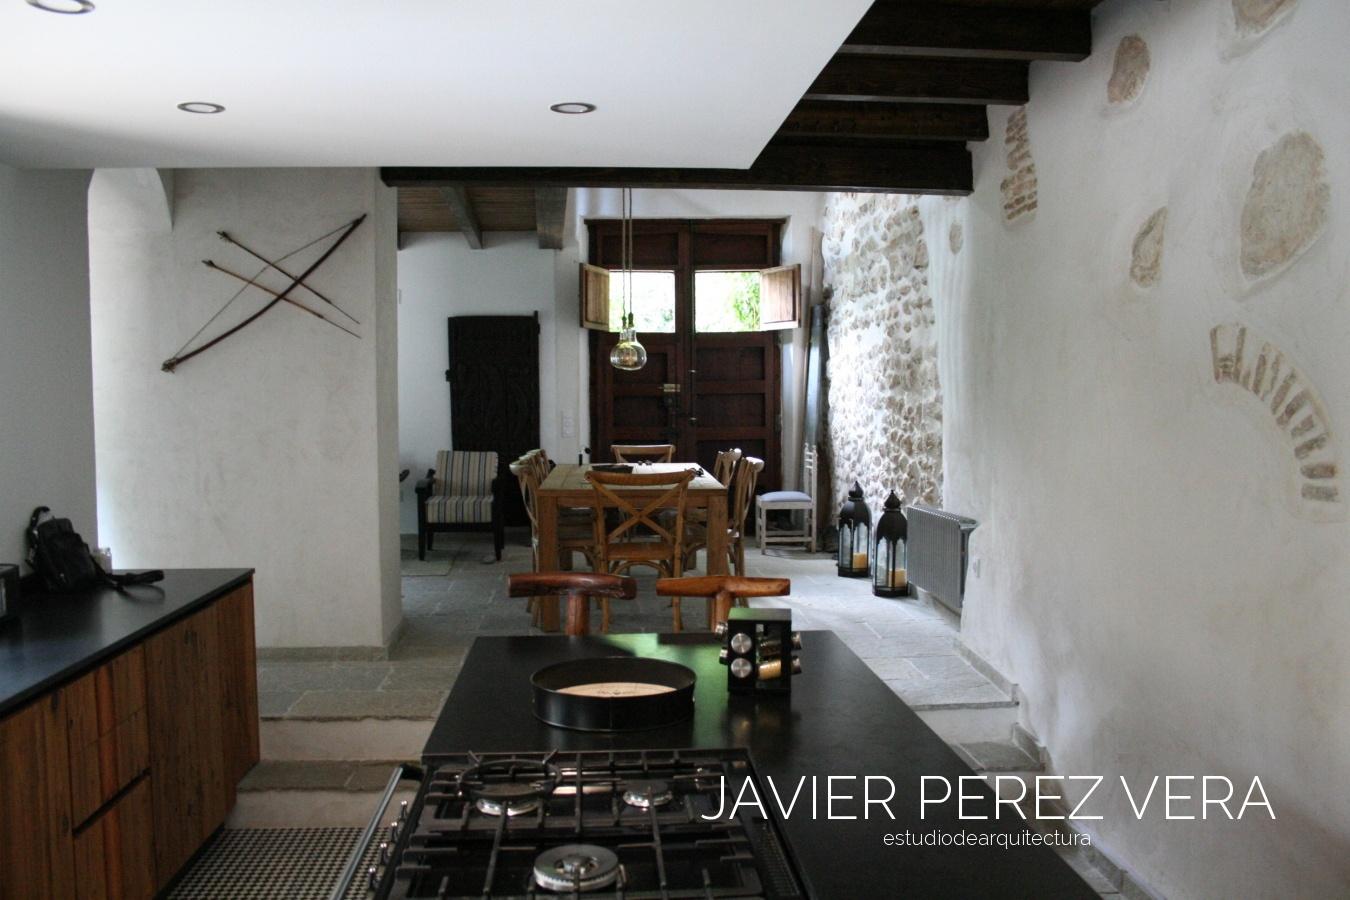 VILLA PESQUERA REHABILITACION - JAVIER PEREZ VERA, estudiodearquitectura